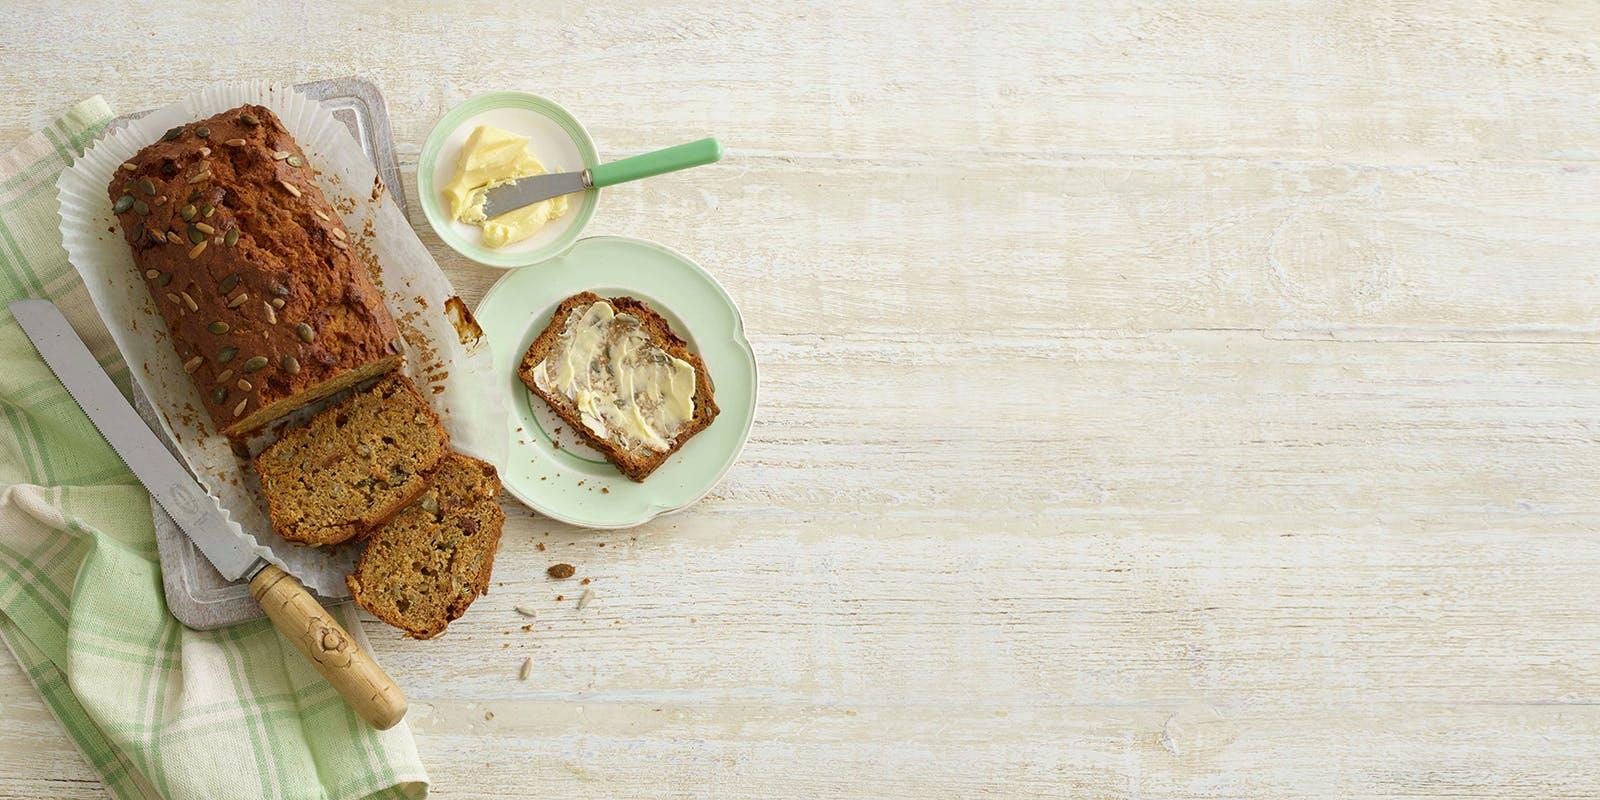 Banana, carrot and seed bread